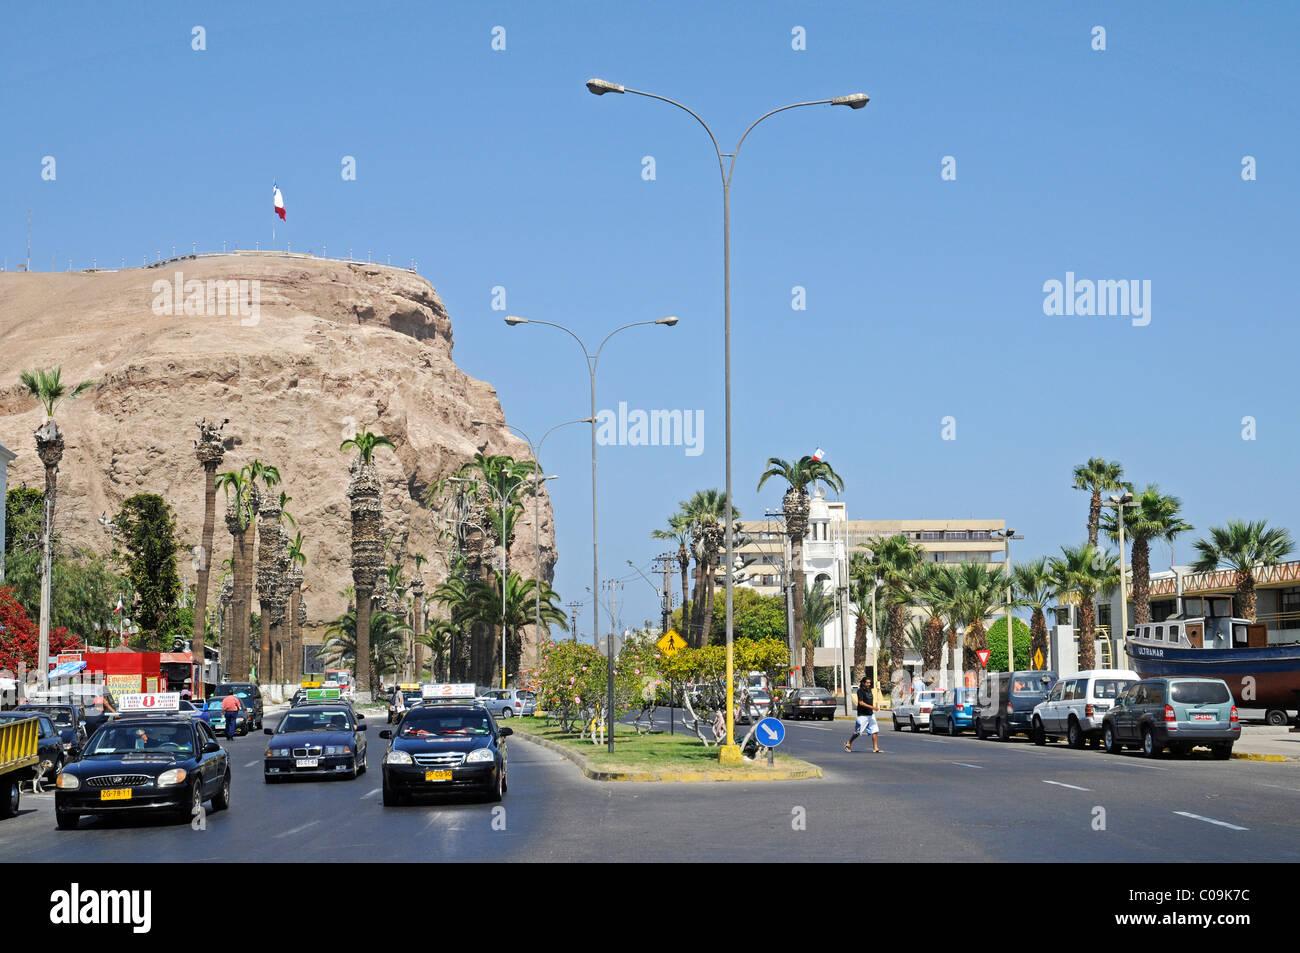 El Morro, mountain, landmark, theater of war, War of the Pacific, road traffic, Arica, Norte Grande, northern Chile, - Stock Image